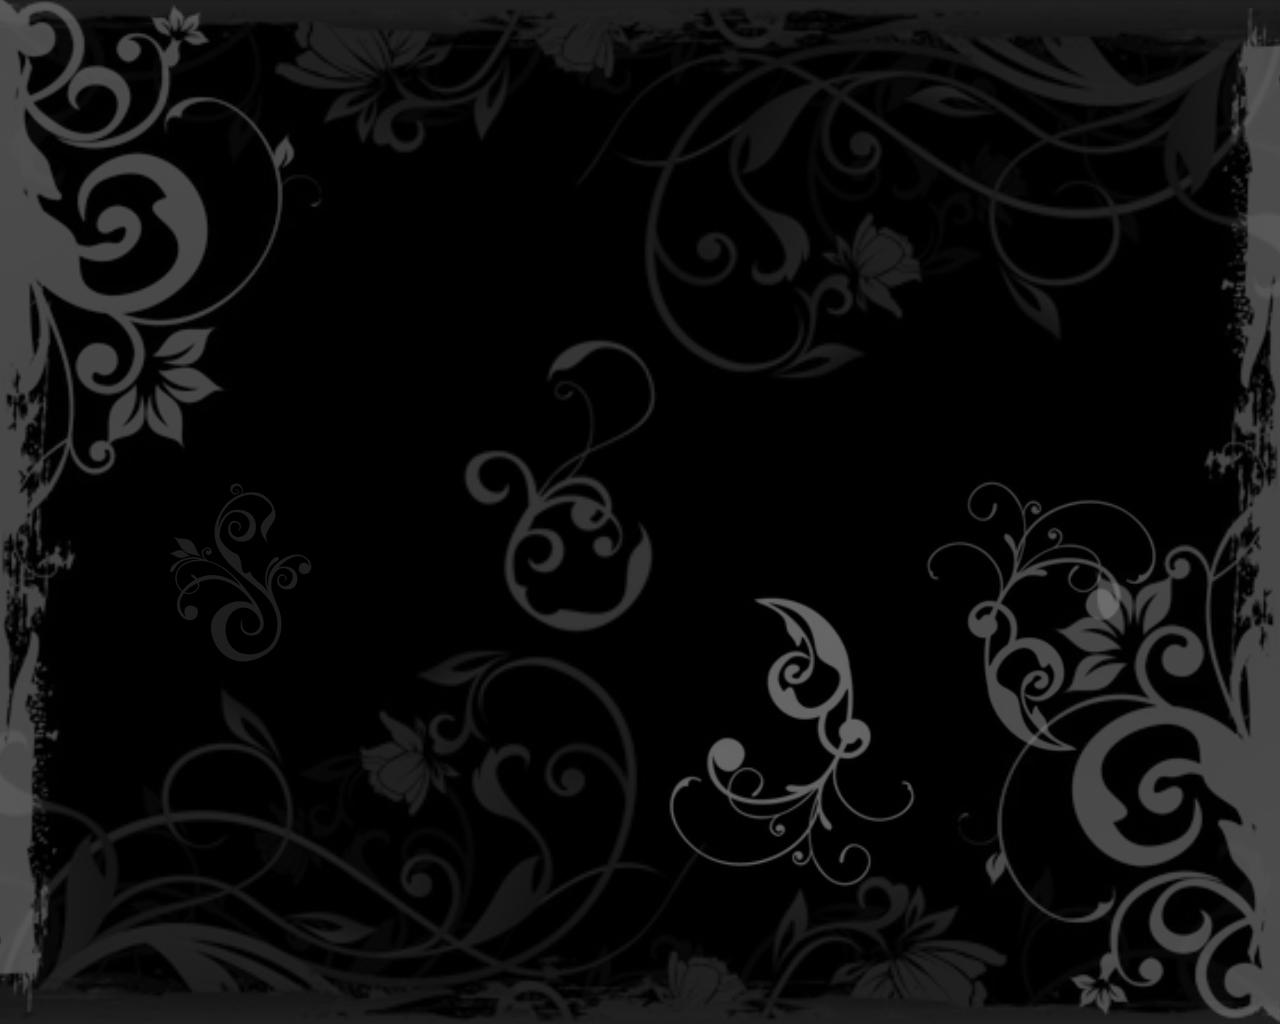 http://1.bp.blogspot.com/-YqCFAykVnX8/UITLpmeg_TI/AAAAAAAAJWA/aF0q0oGMy5w/s1600/black-wallpaper-35.jpg